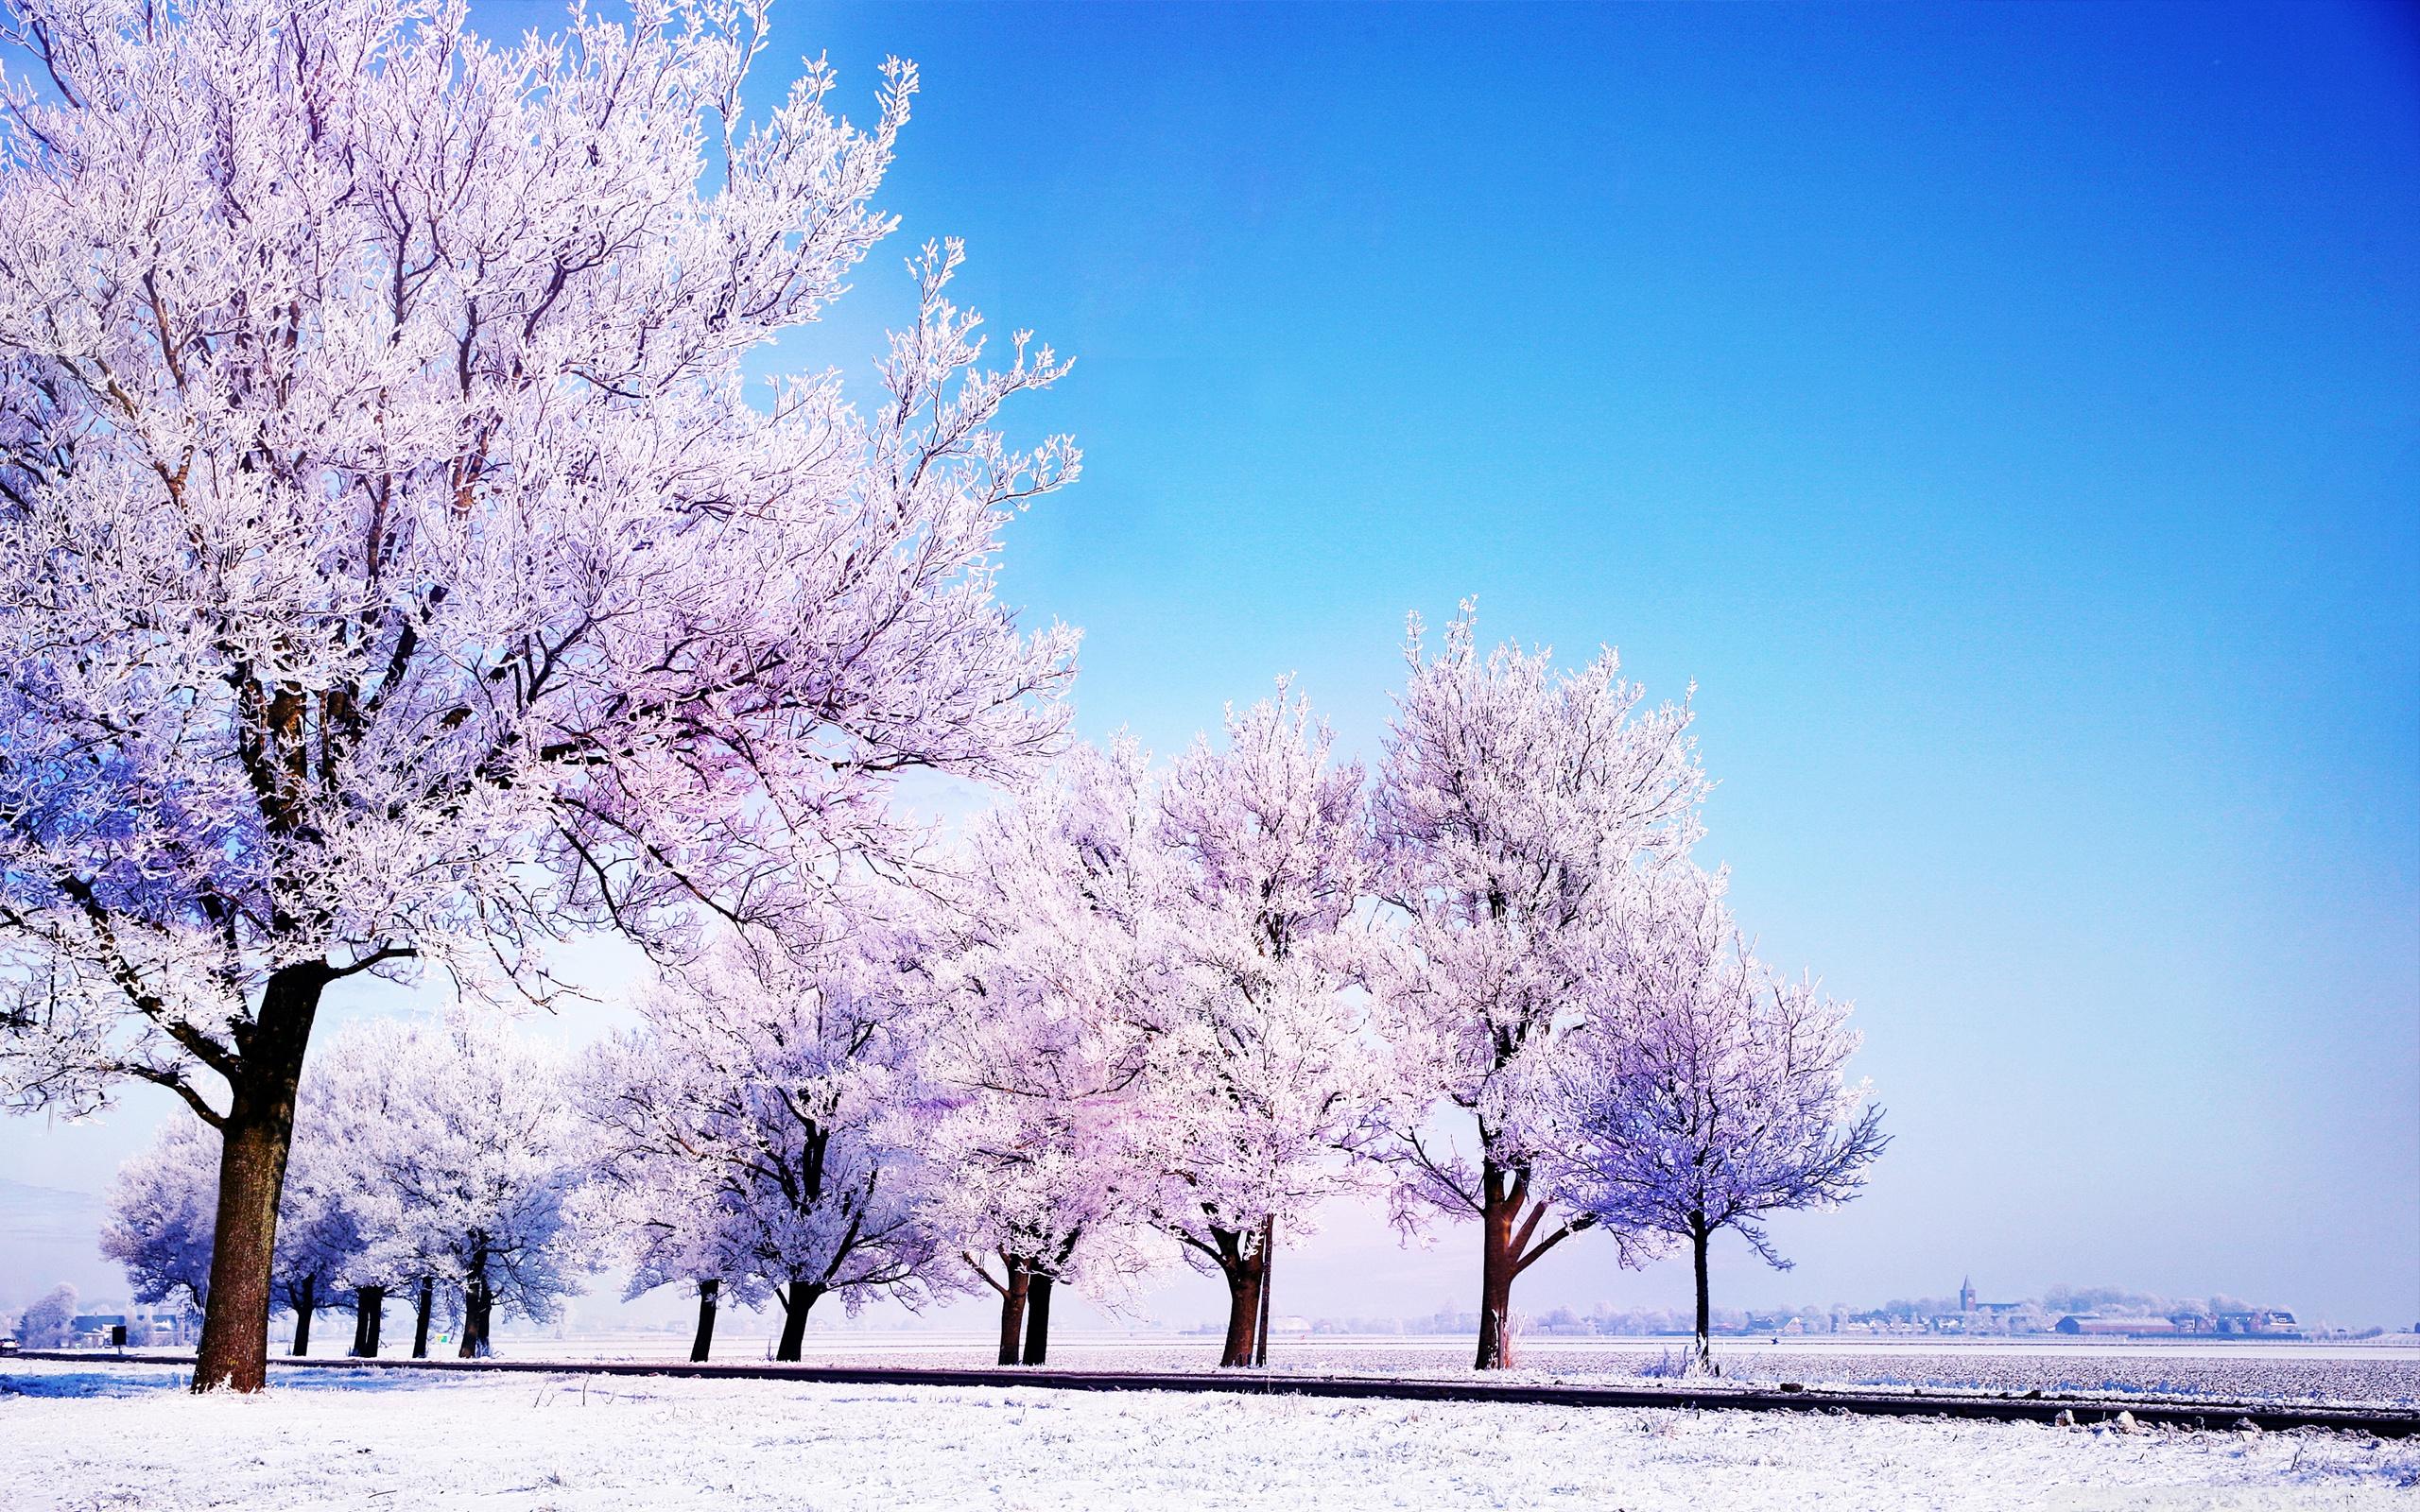 Winter Backgrounds wallpaper 2560x1600 51266 2560x1600